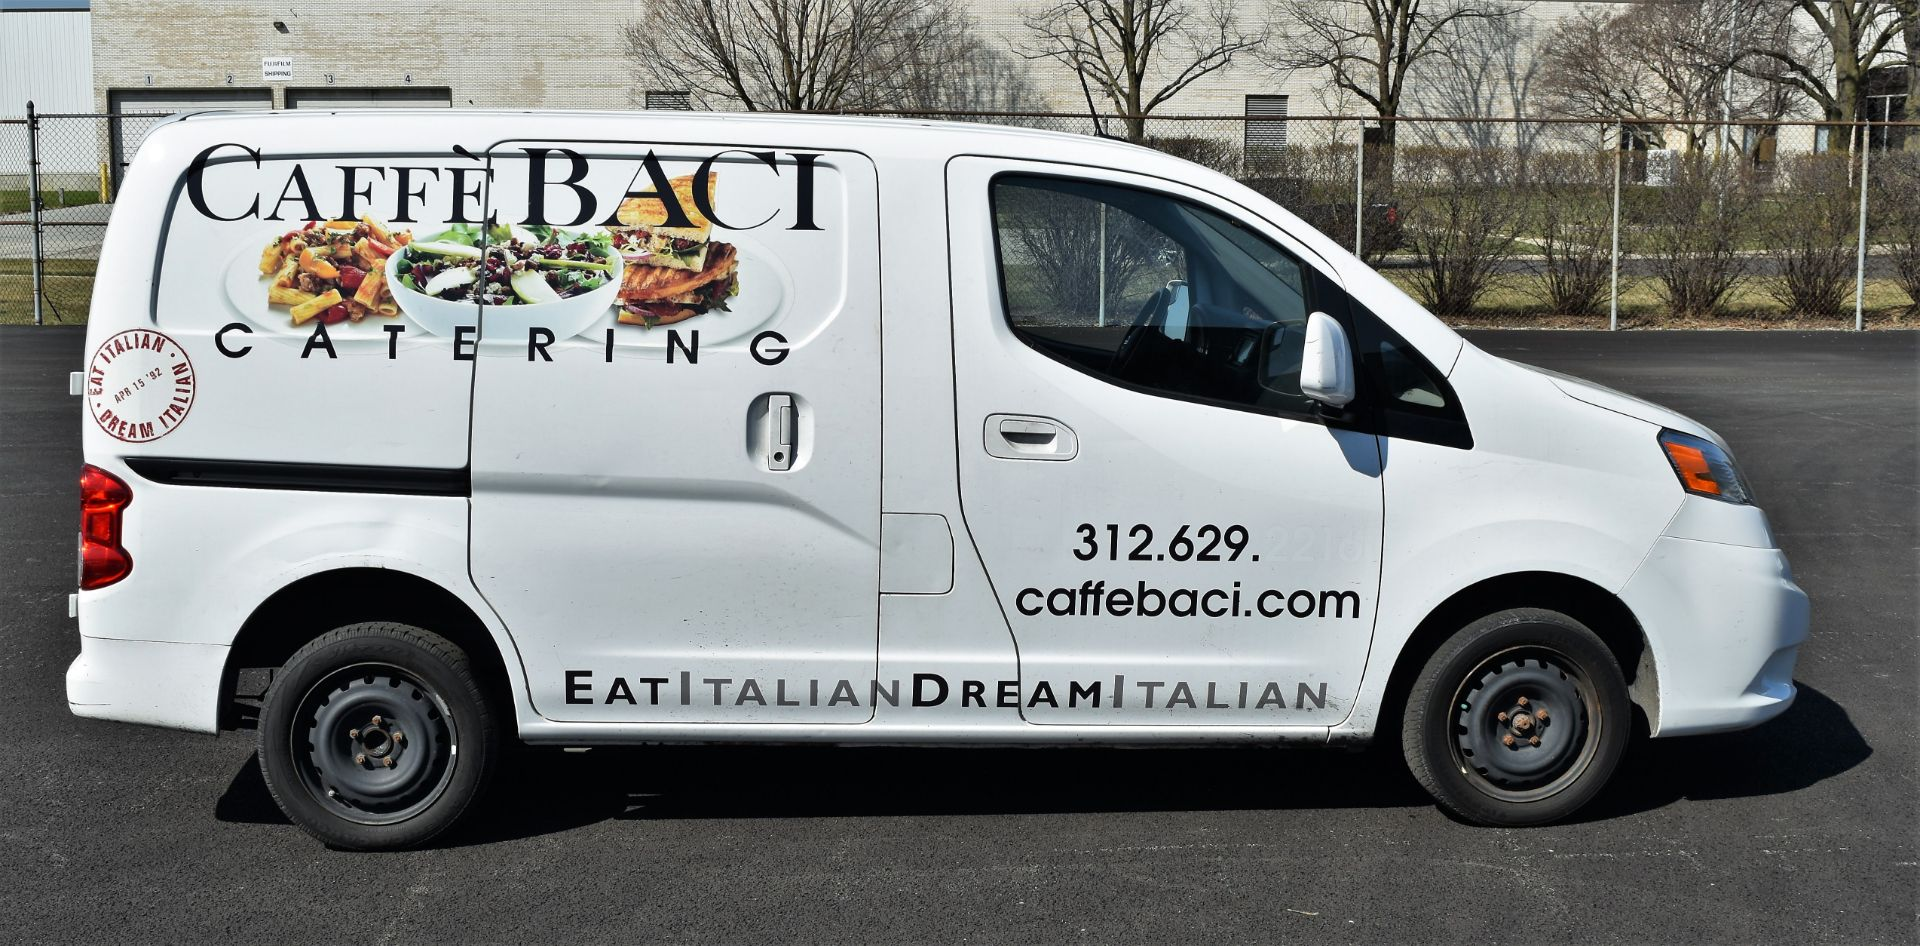 2013 Nissan NV200 Delivery Van - Image 48 of 54